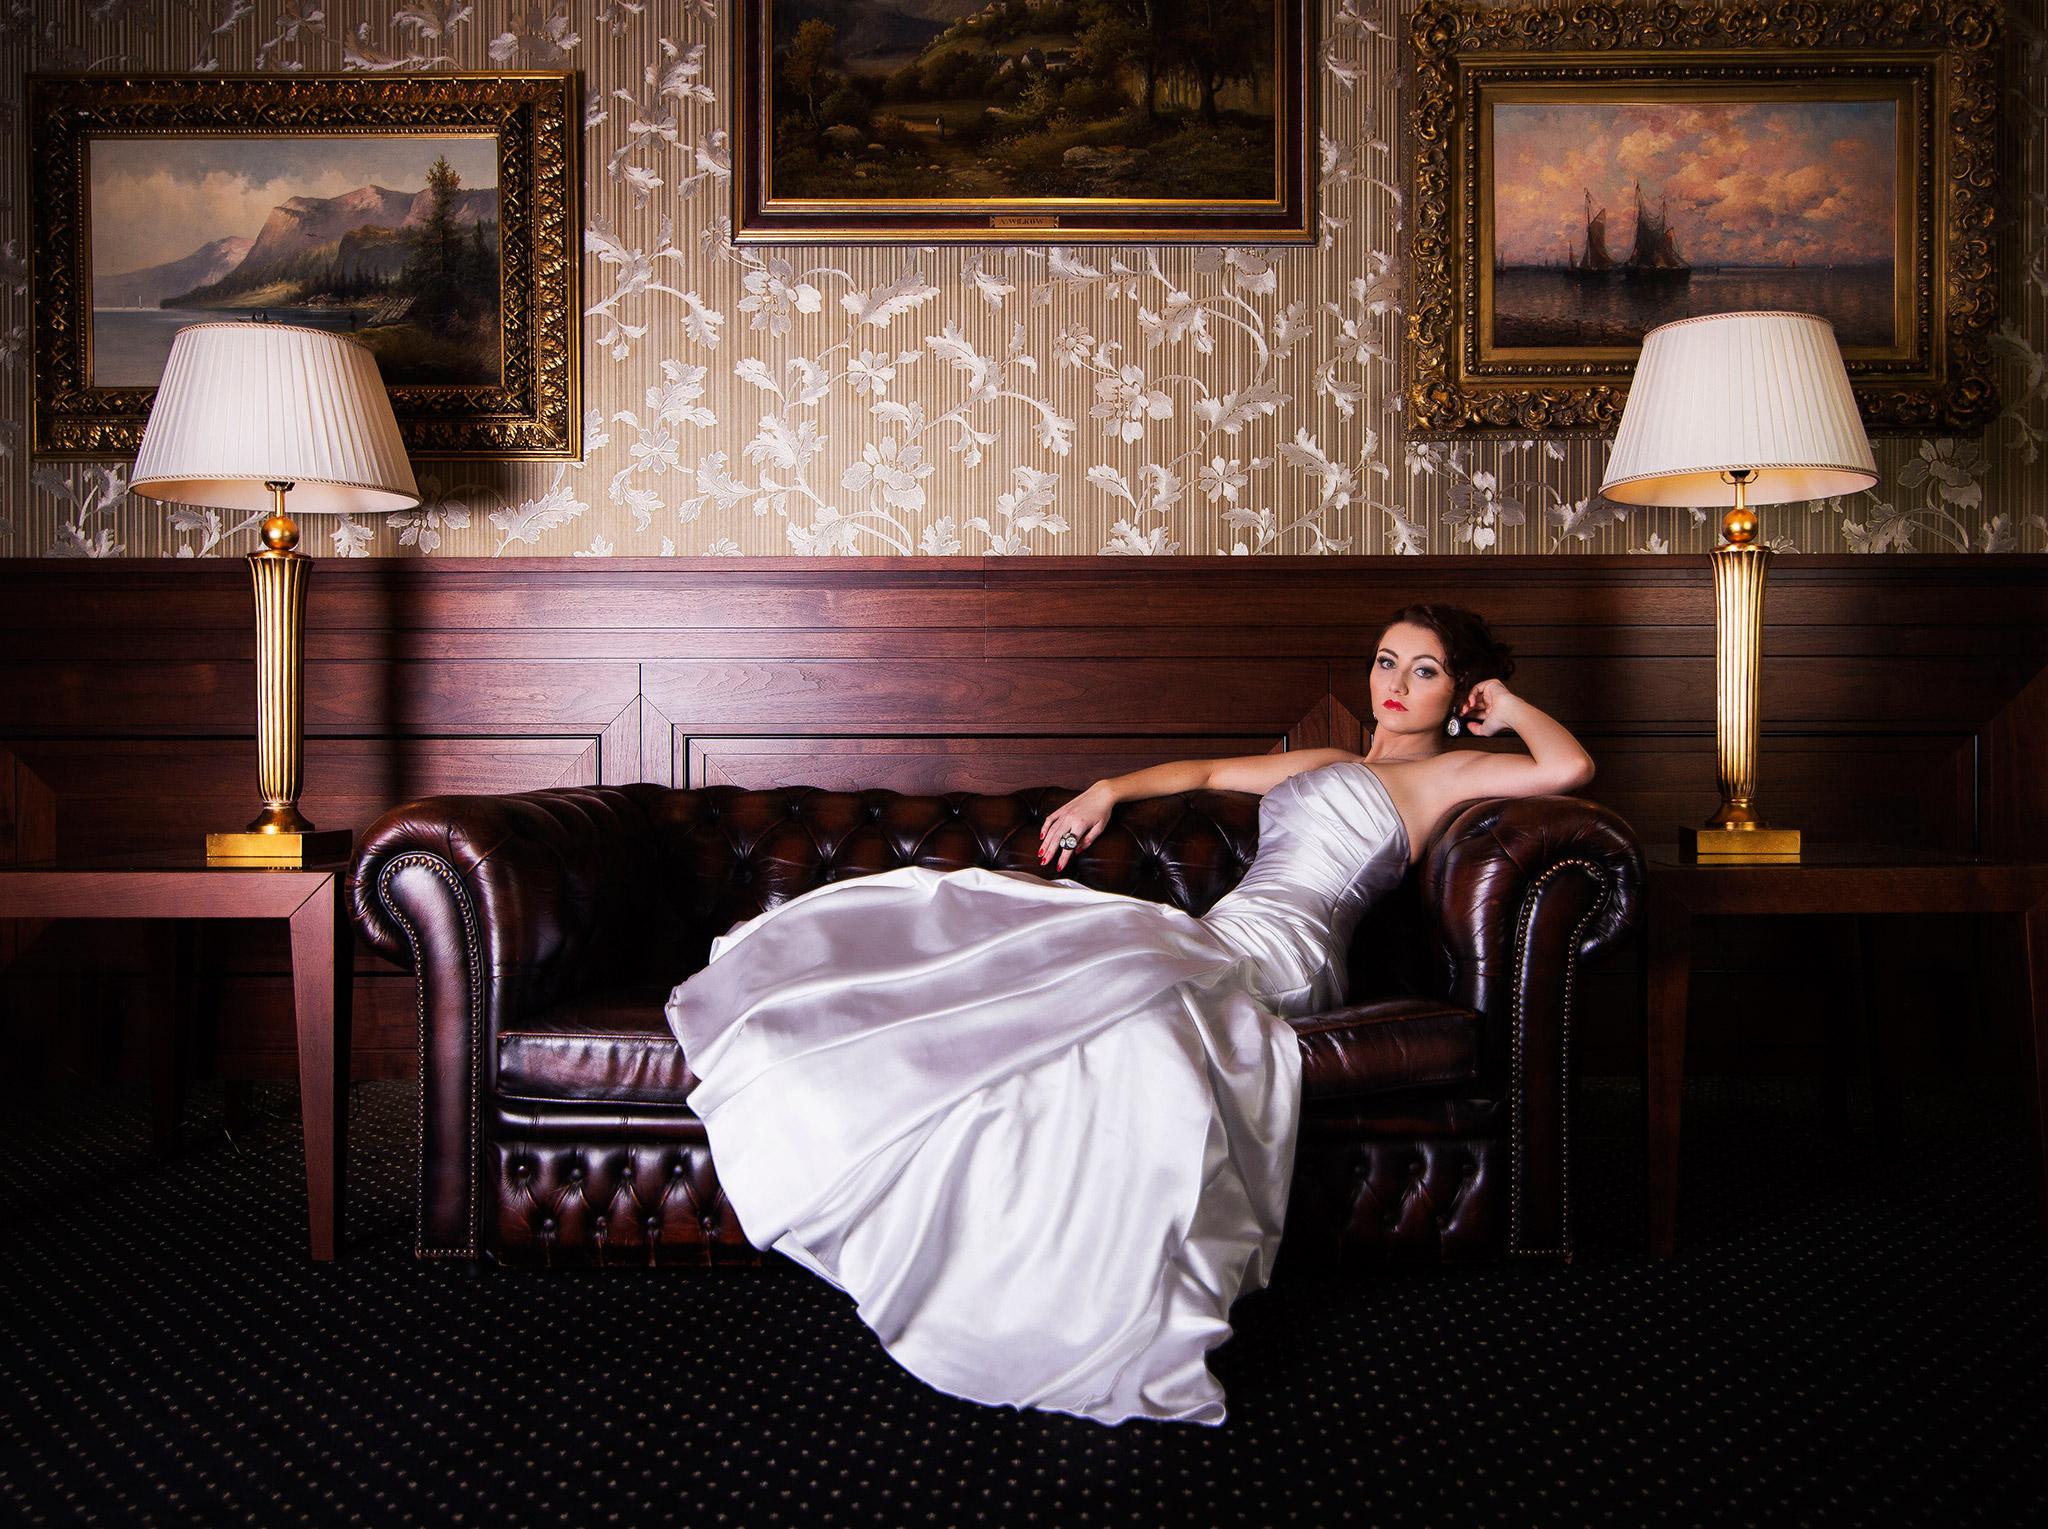 akty , boudour , portrety , foceni ,fotograf karlovy vary , atelier , fotoatelier , profesionalni fotograf, svatebni fotograf , moda , beauty , relax , foceni cz,svatby , deti , rodinne foceni , foceni deti